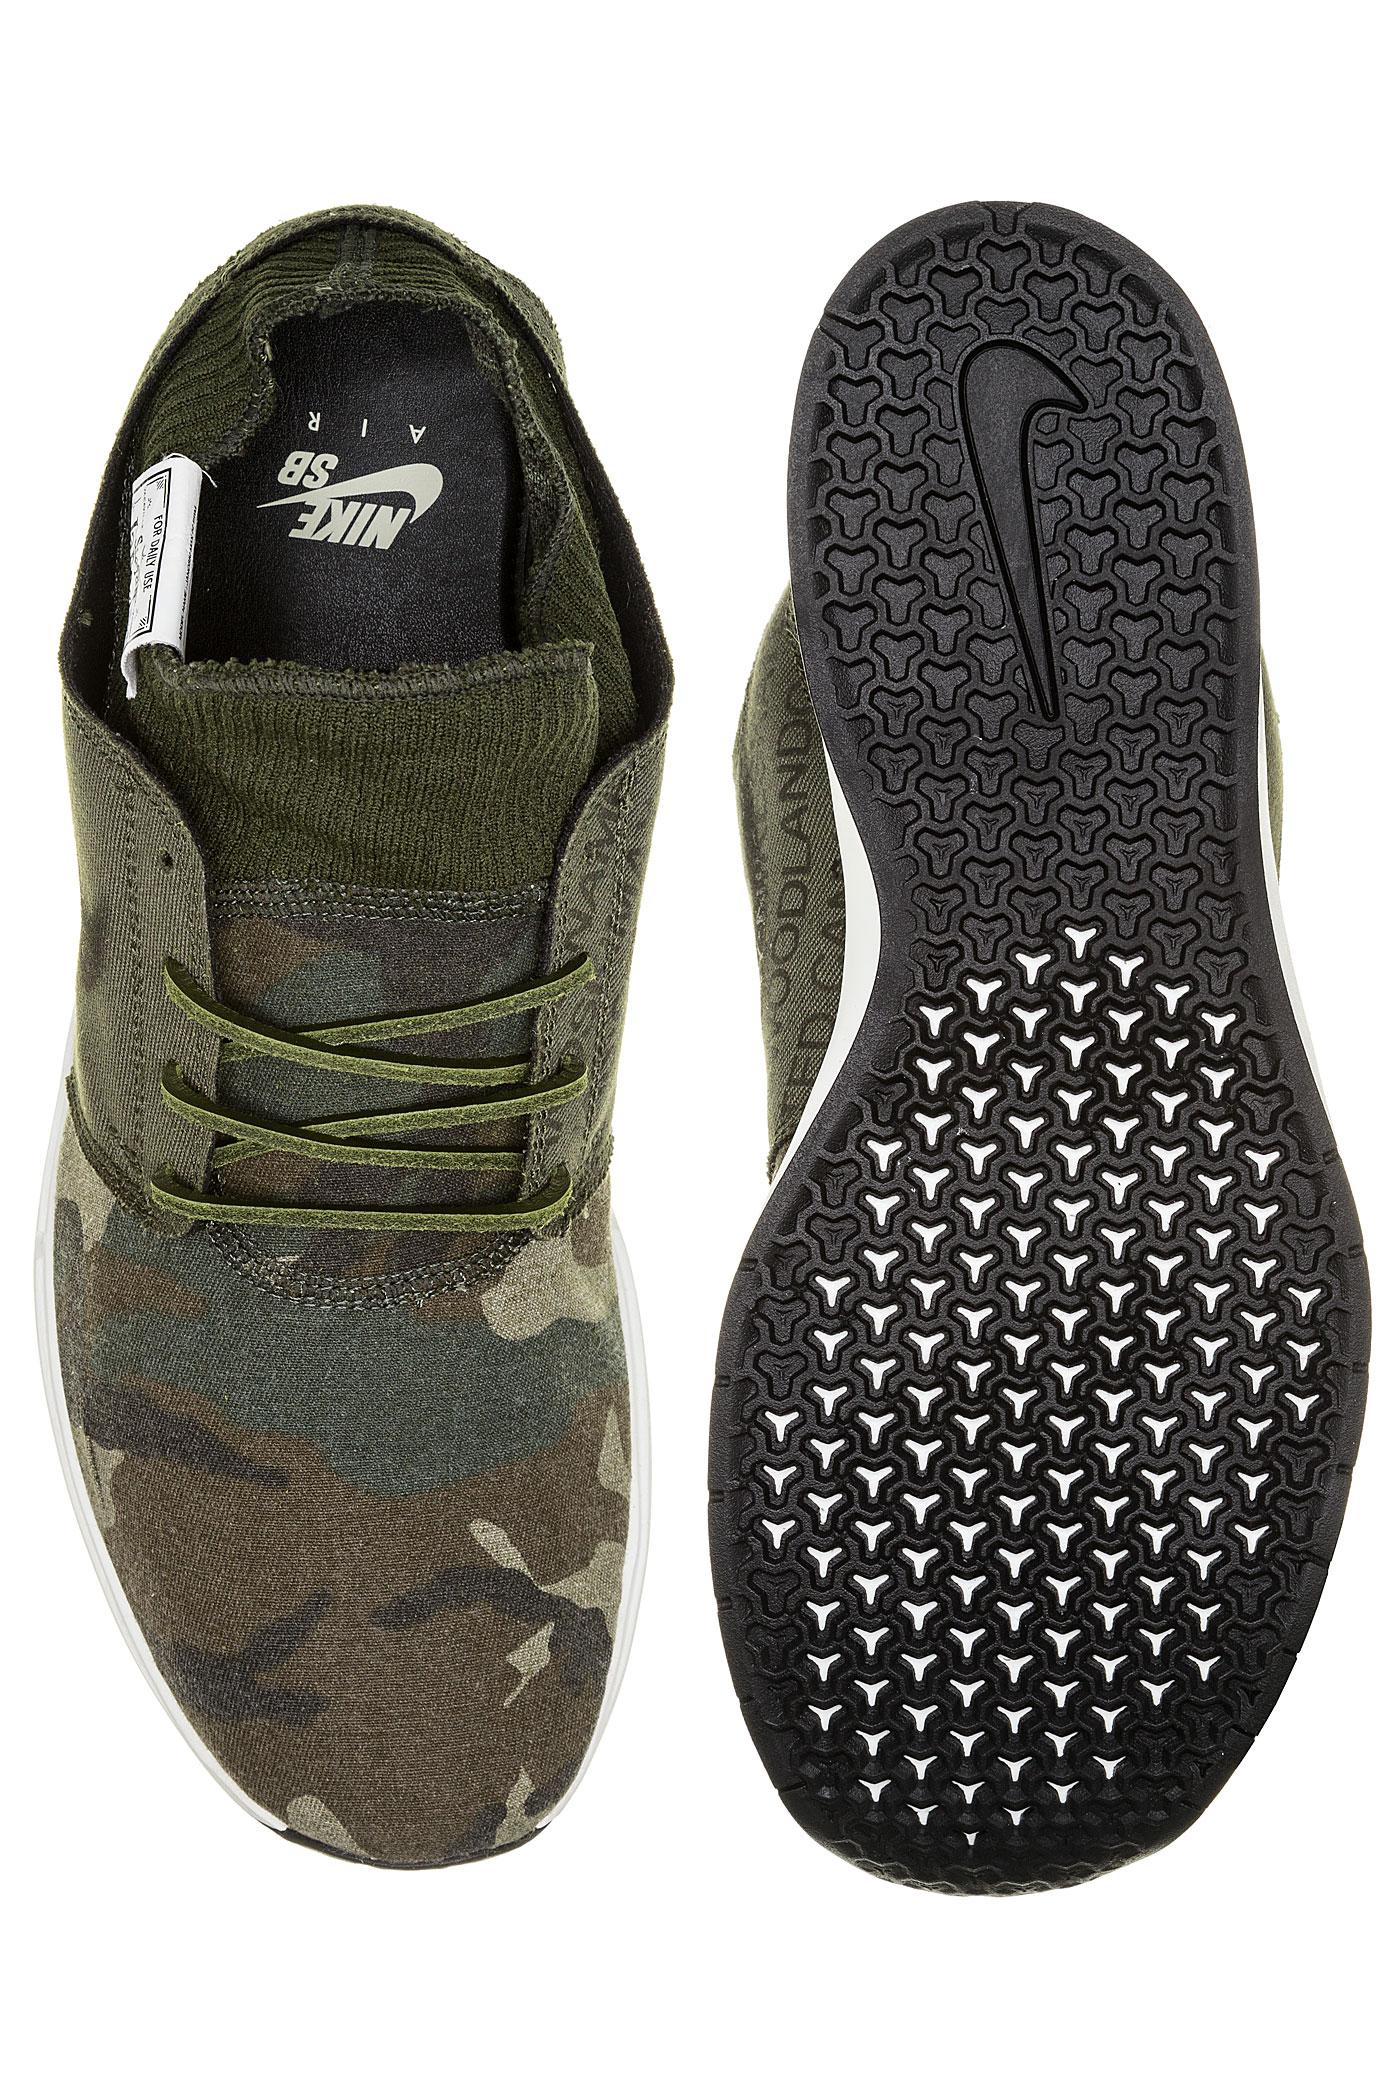 Janoski Sb Khaki Black Nike Cargo Air 2 Premium Max Chaussureiguana F1JKlc